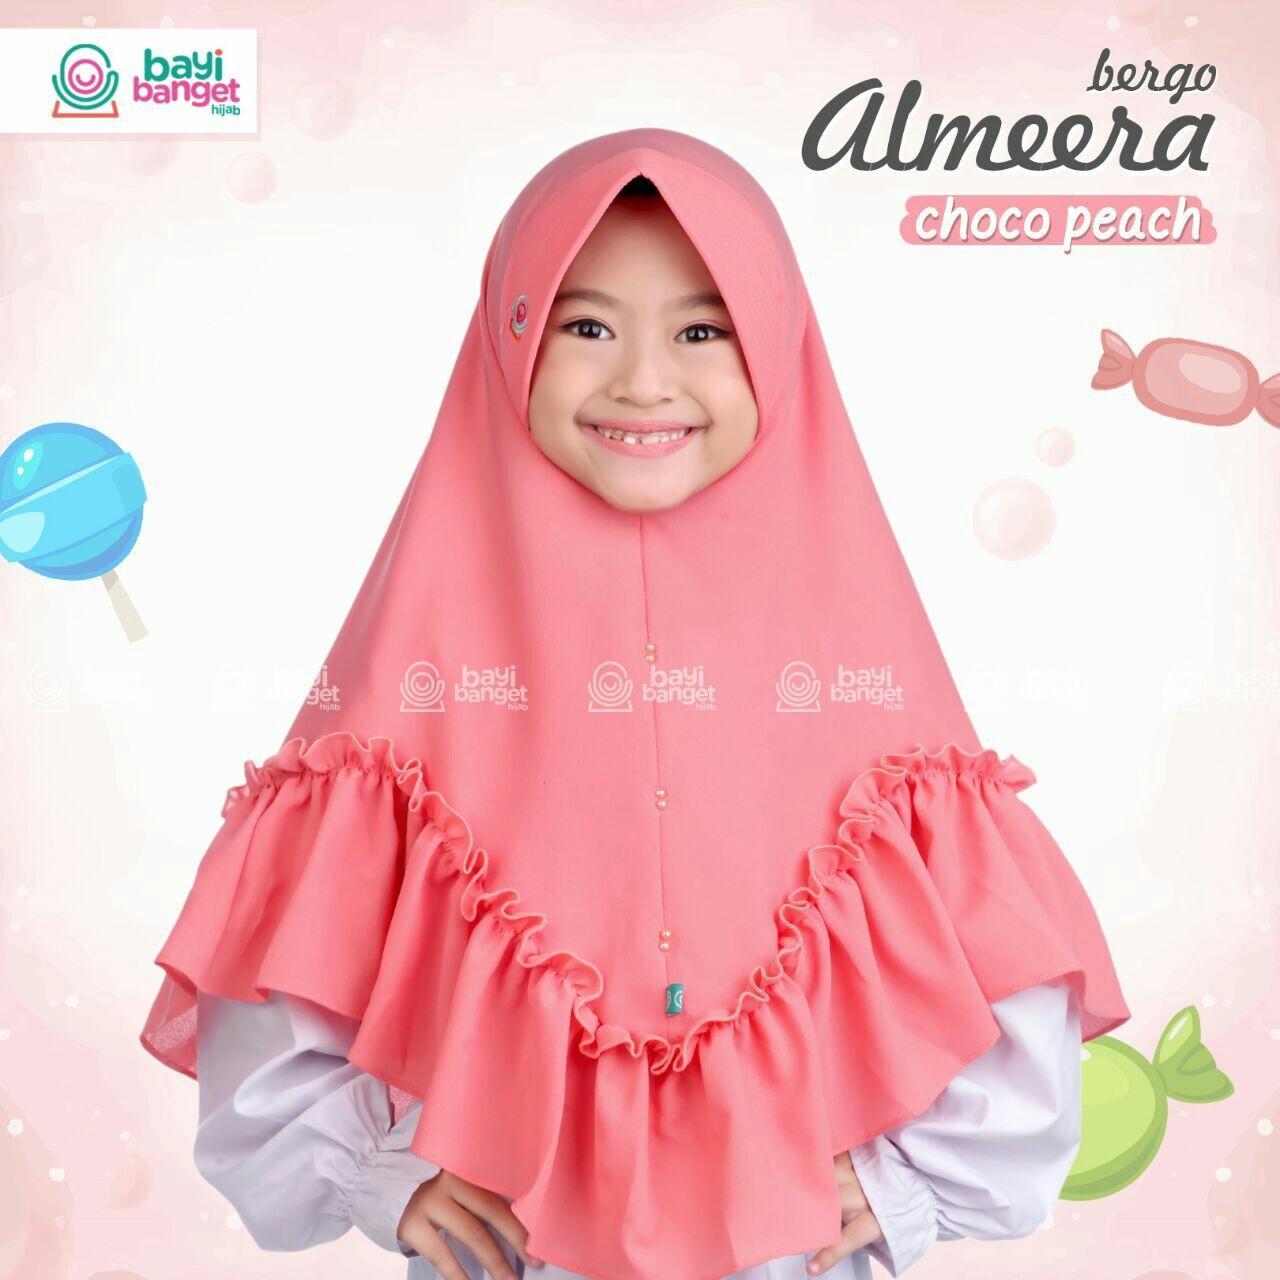 Fairuz Hijab, Jilbab Anak Langsung Pakai, hijab Instan Anak, Kerudung Anak Remaja Perempuan Usia 8 tahun - 12 tahun